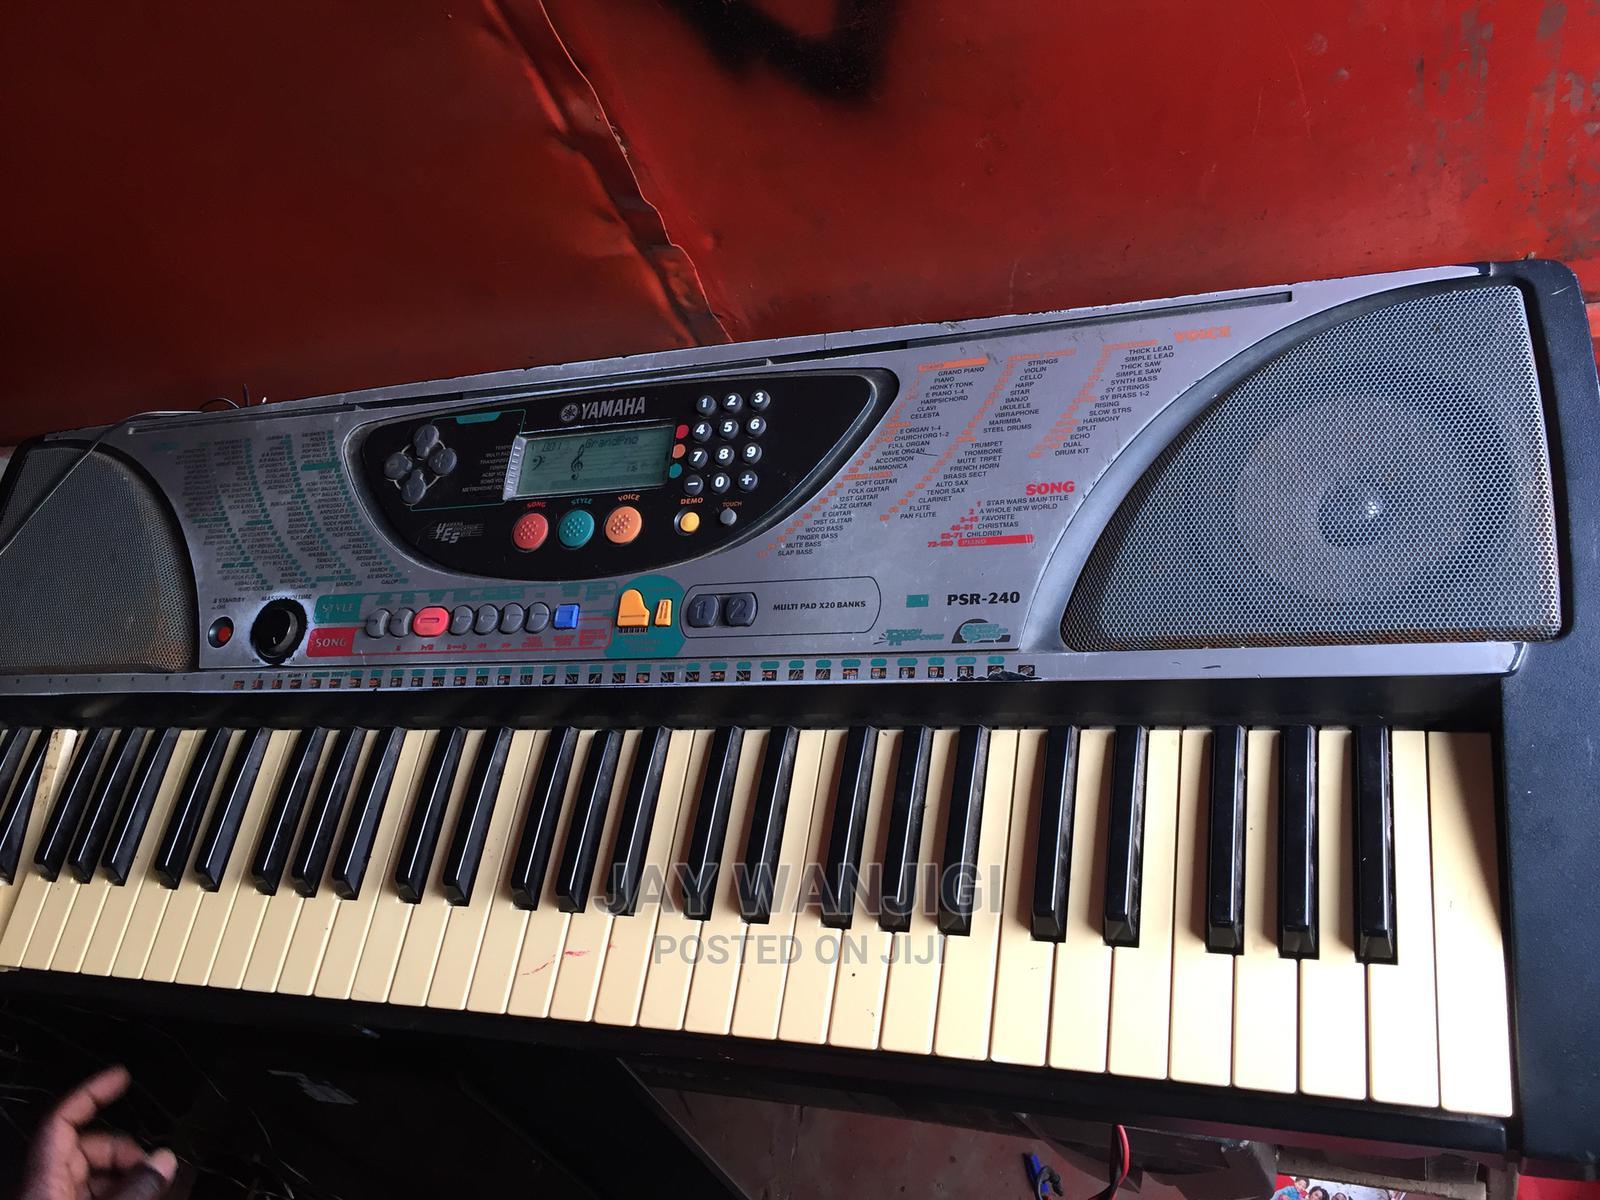 Yamaha PSR-240 61-Key Portable Electronic Keyboard | Musical Instruments & Gear for sale in Nairobi Central, Nairobi, Kenya